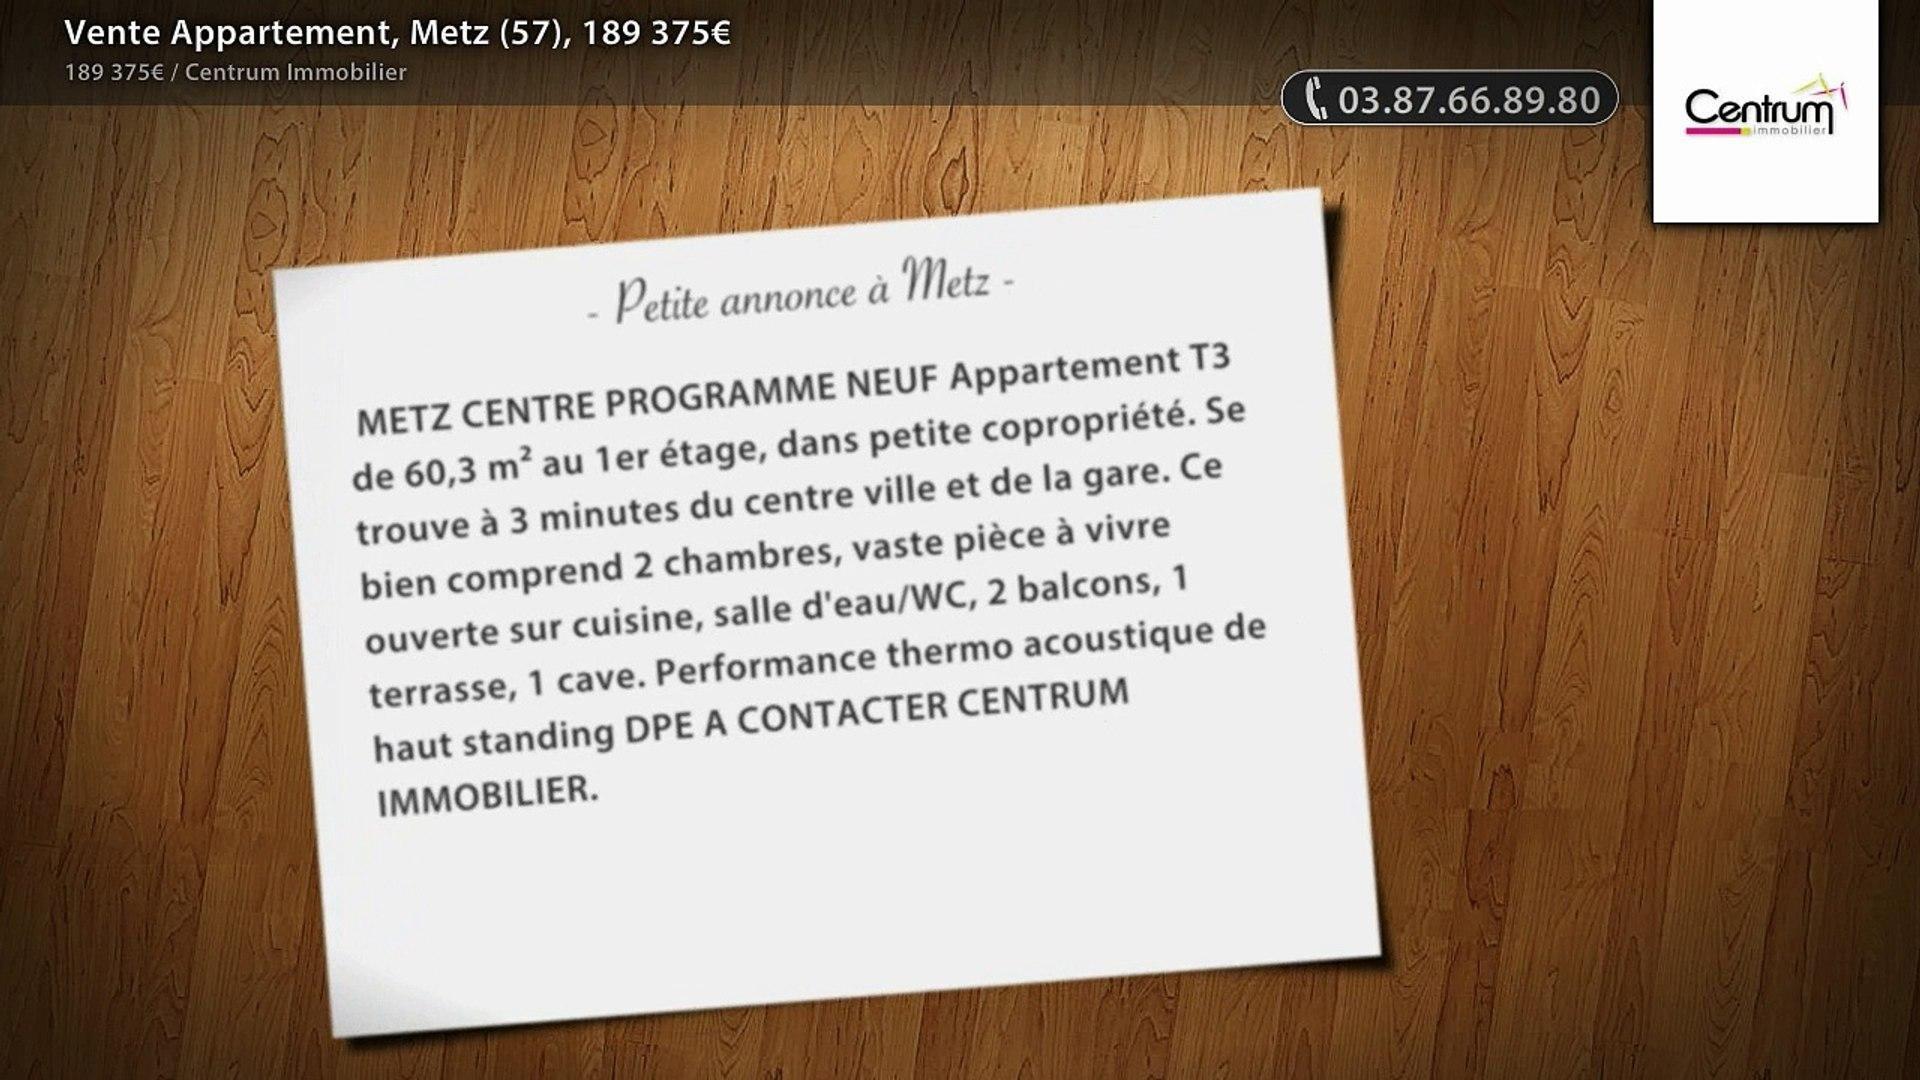 Vente Appartement, Metz (57), 189 375€